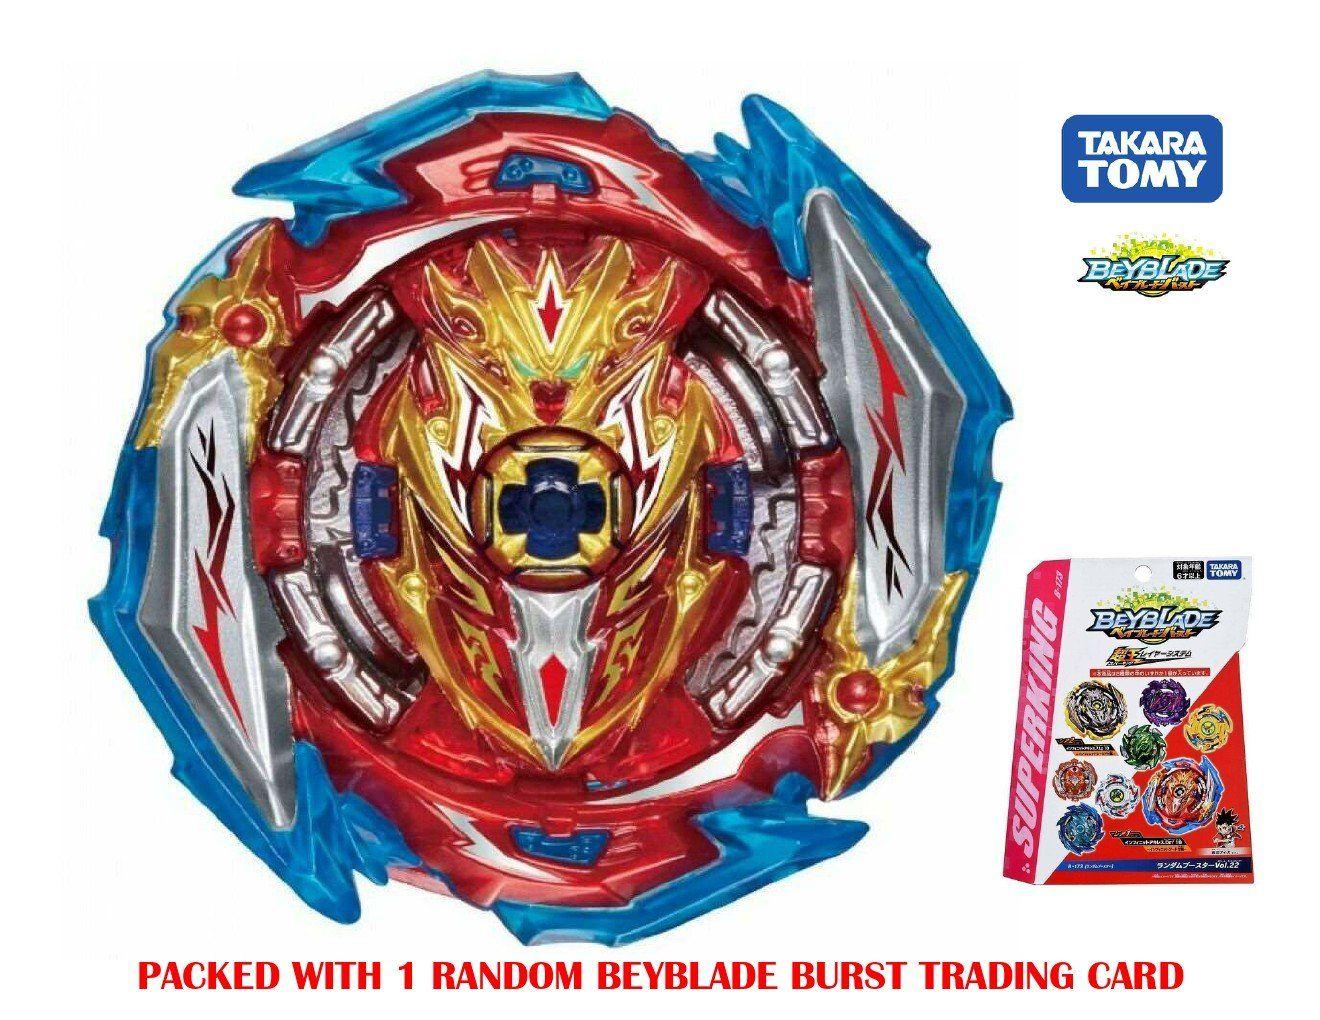 Pre Order Takara Tomy Beyblade Burst Booster Vol 22 B 173 01 Superking Surge Infinite Achilles Dimension 1b Japan Vers Takara Tomy Beyblade Burst Japan Time